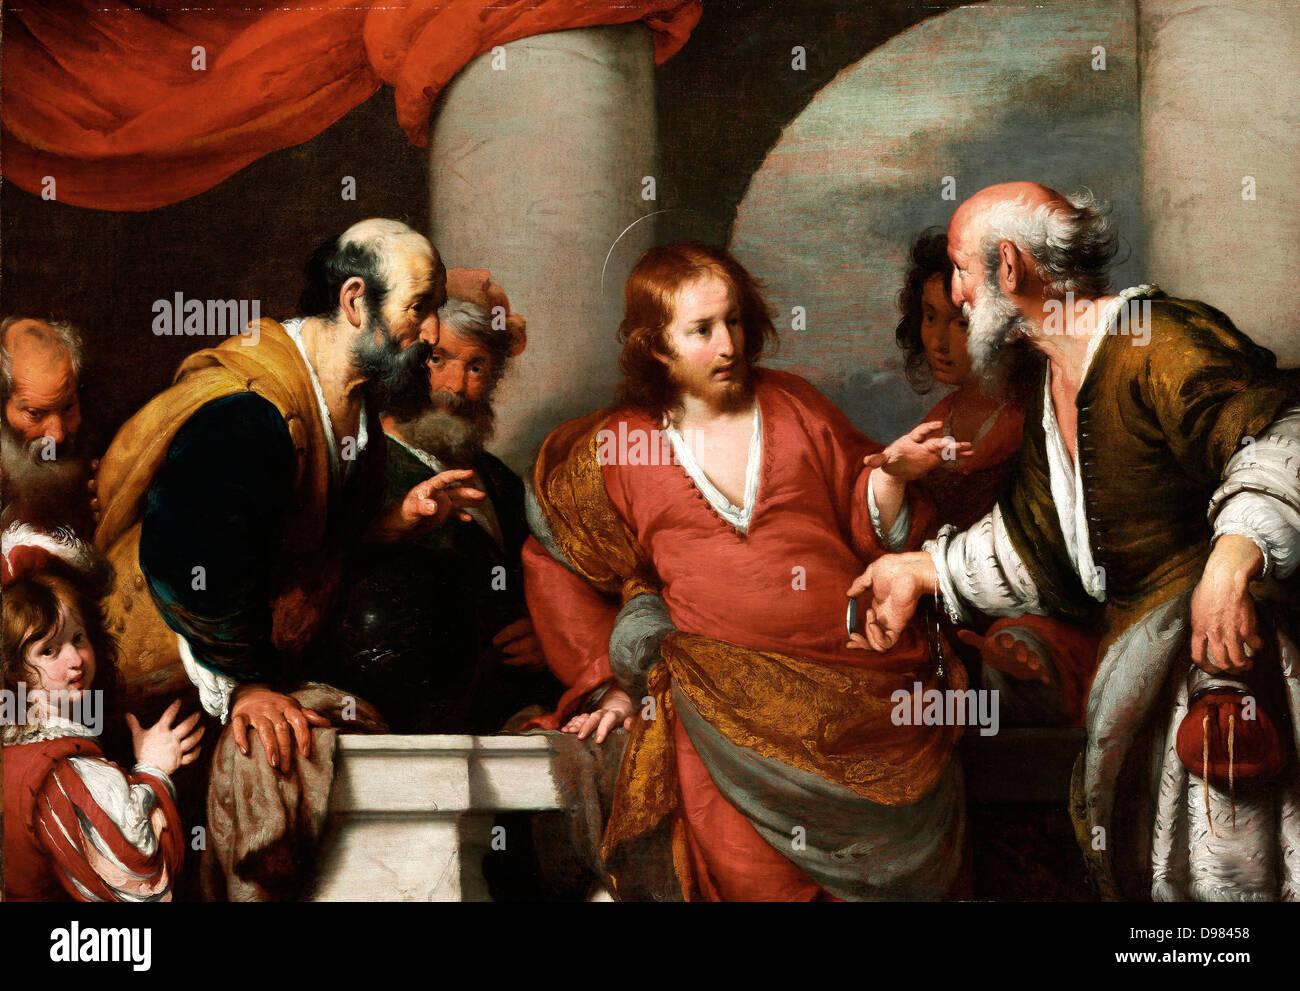 Bernardo Strozzi, die Tribut-Geld. 1630er Jahren Öl auf Leinwand. Museum of Fine Arts, Budapest. Stockbild